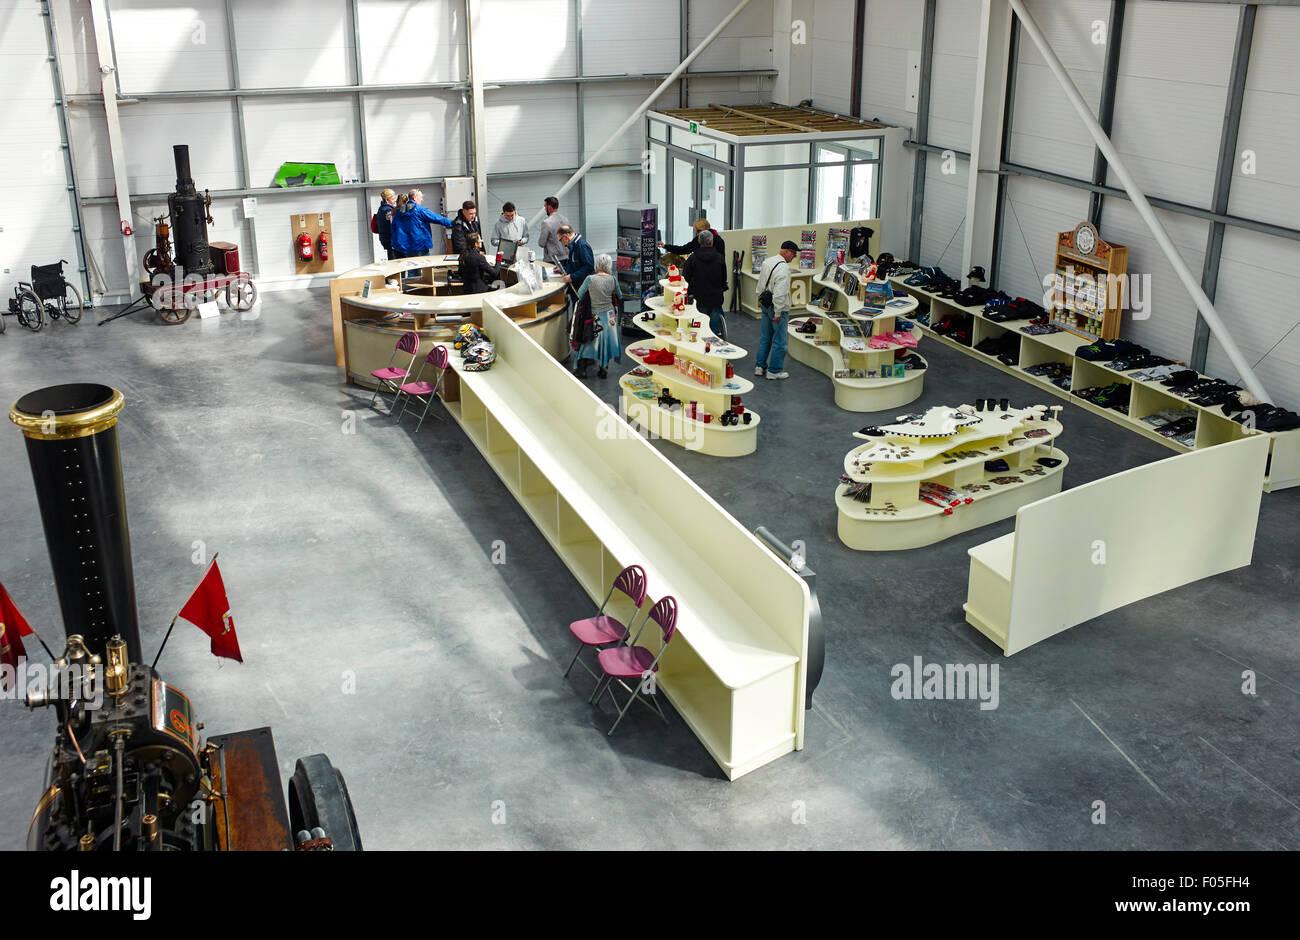 Manx motor museum shop - Stock Image